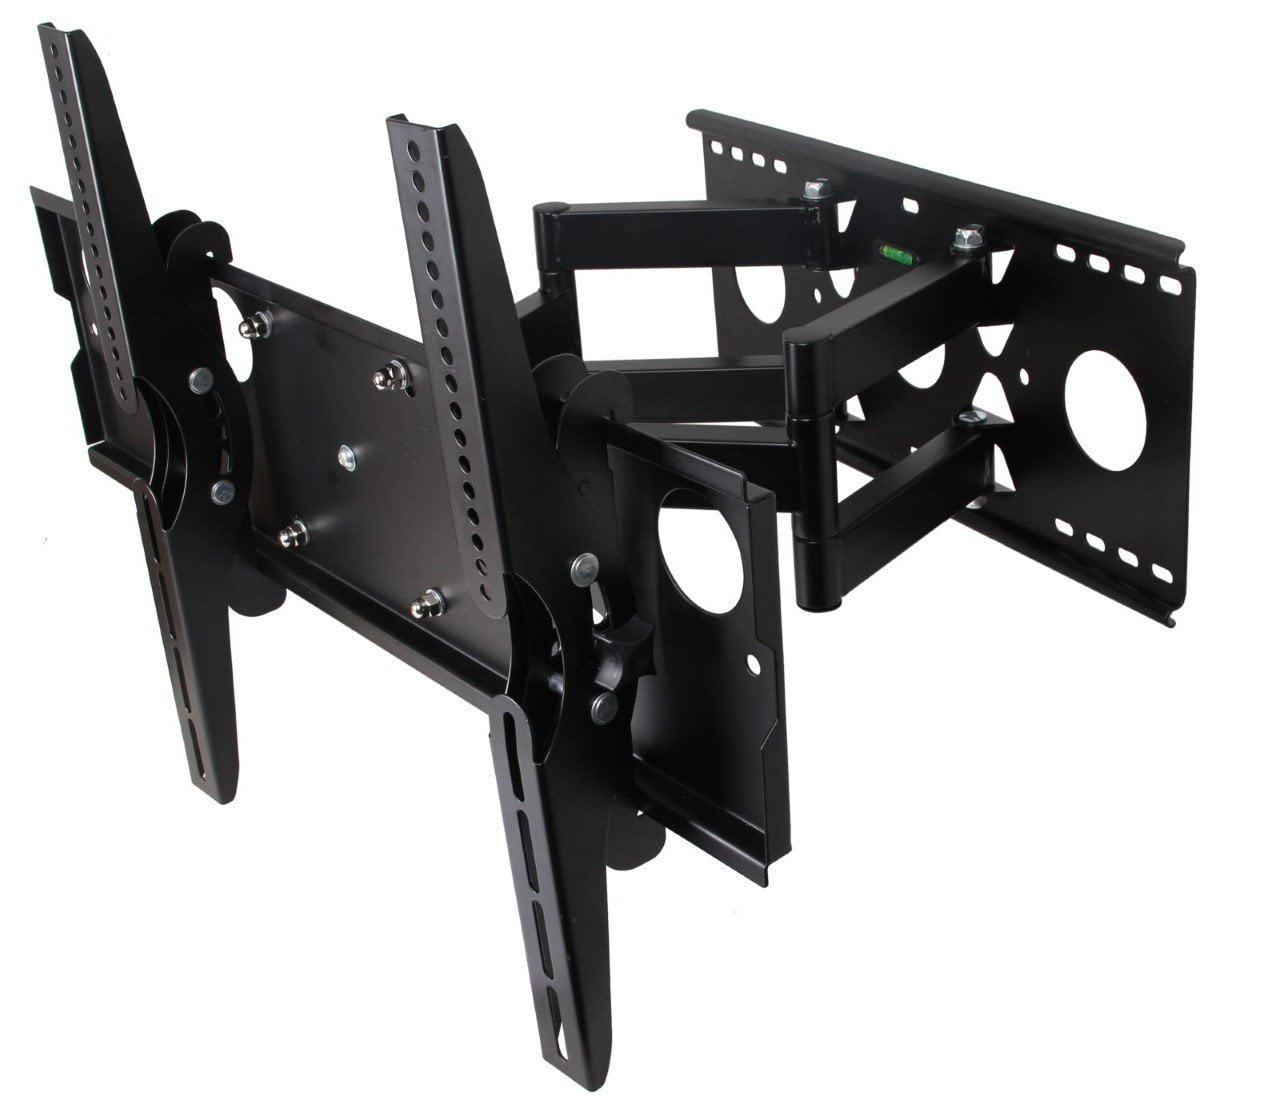 Husky Mounts Super Heavy Duty 42 47 50 55 60 65 70 72 80 Inch LED LCD Plasma Flat Screen Full Motion TV Wall Mount, Dual... by